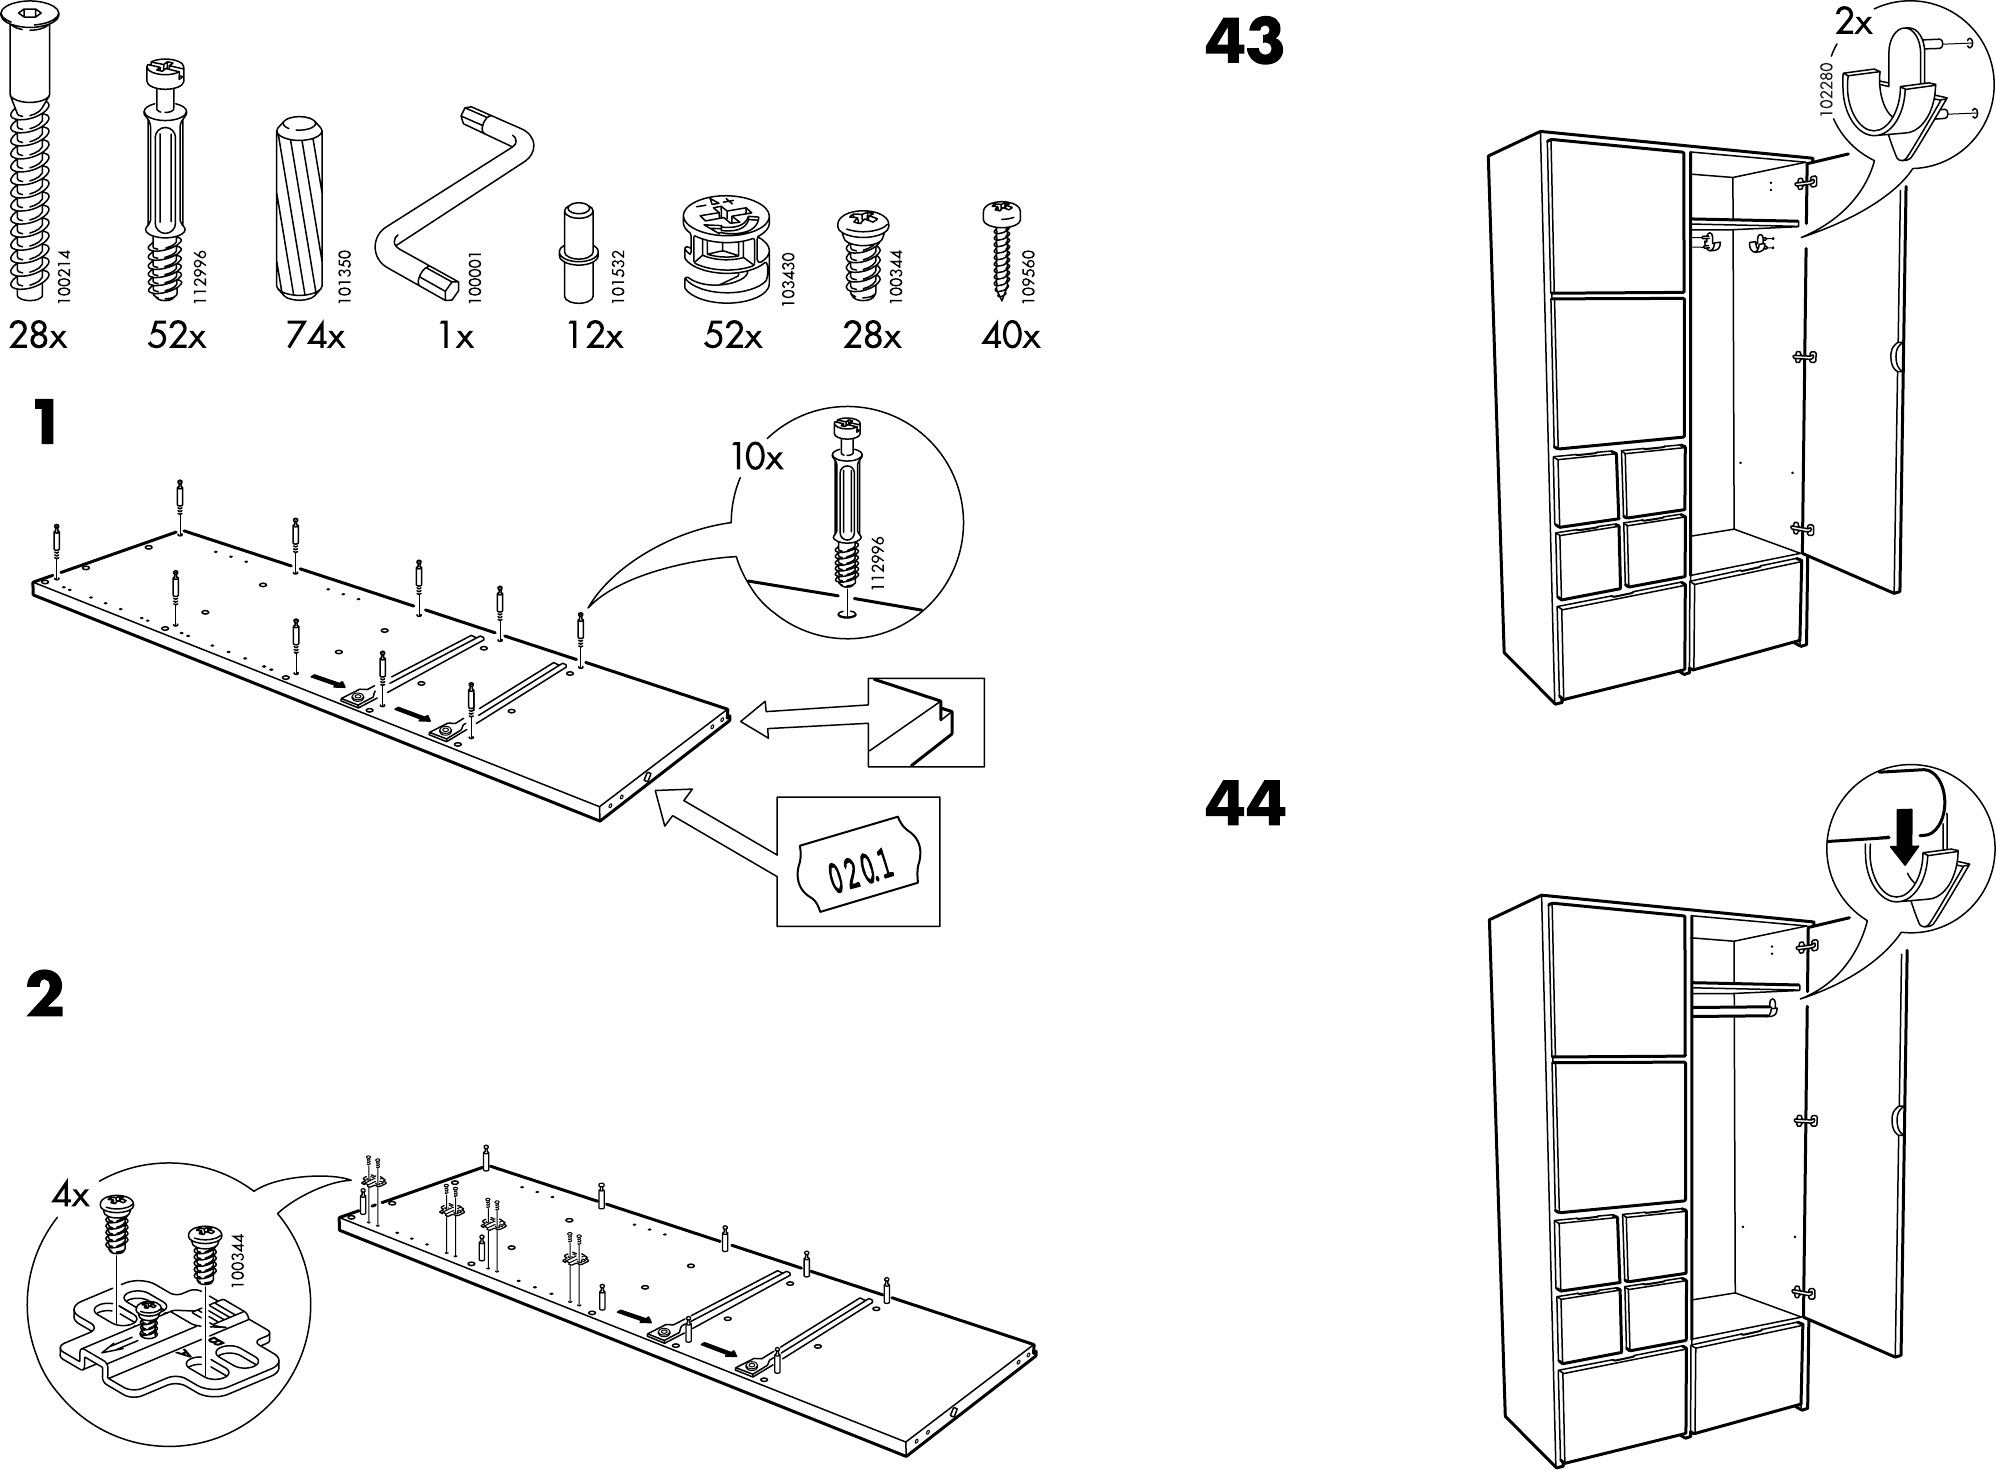 Handleiding Expedit Boekenkast.Handleiding Ikea Rakke Kast Pagina 1 Van 12 Dansk Deutsch